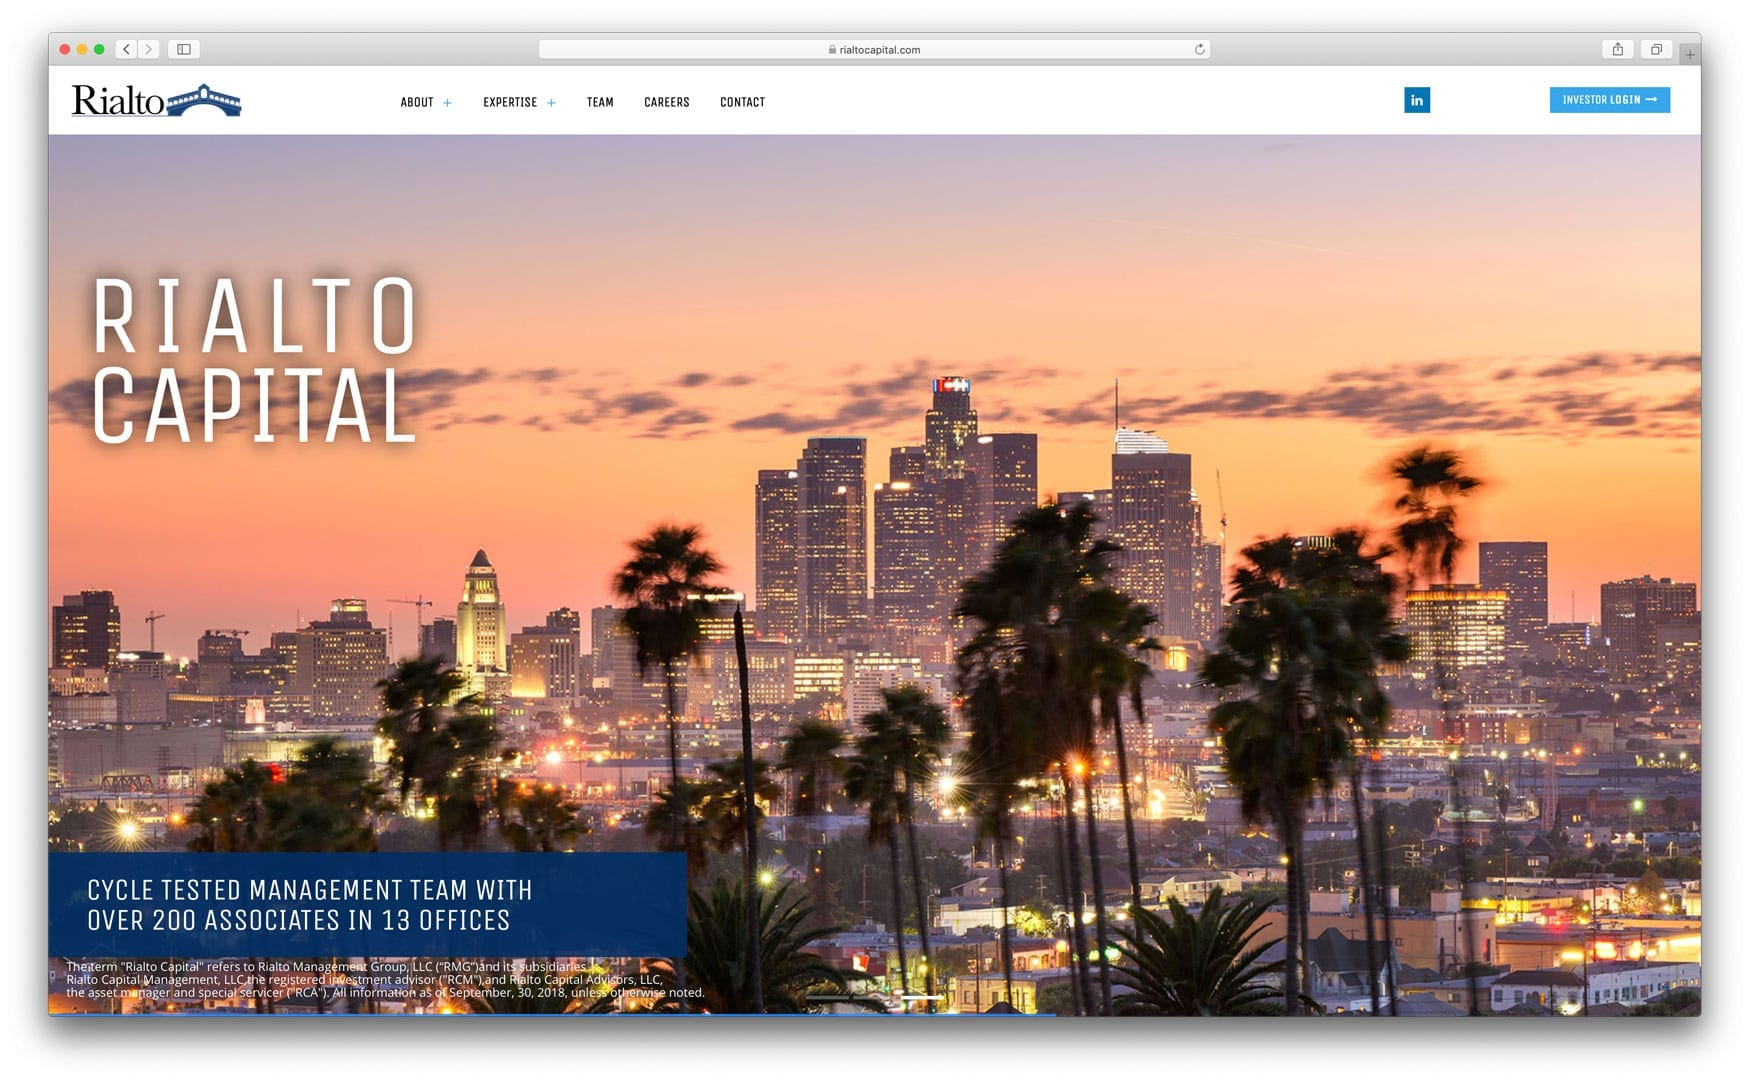 Rialto Capital - New Website Design by sliStudios